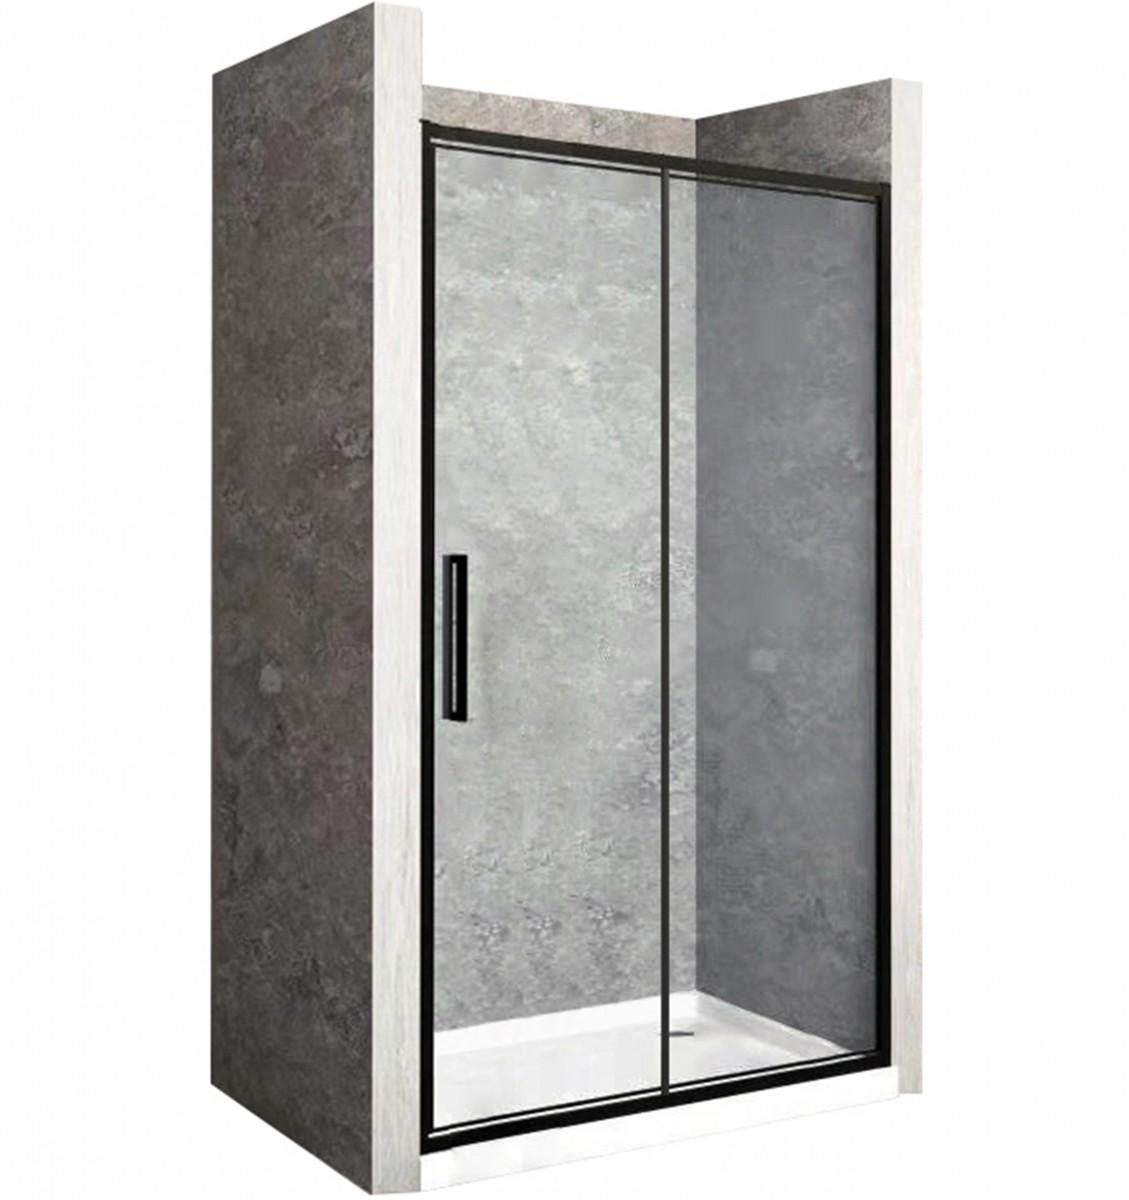 Sprchové dveře skládané Rapid Slide 100 cm